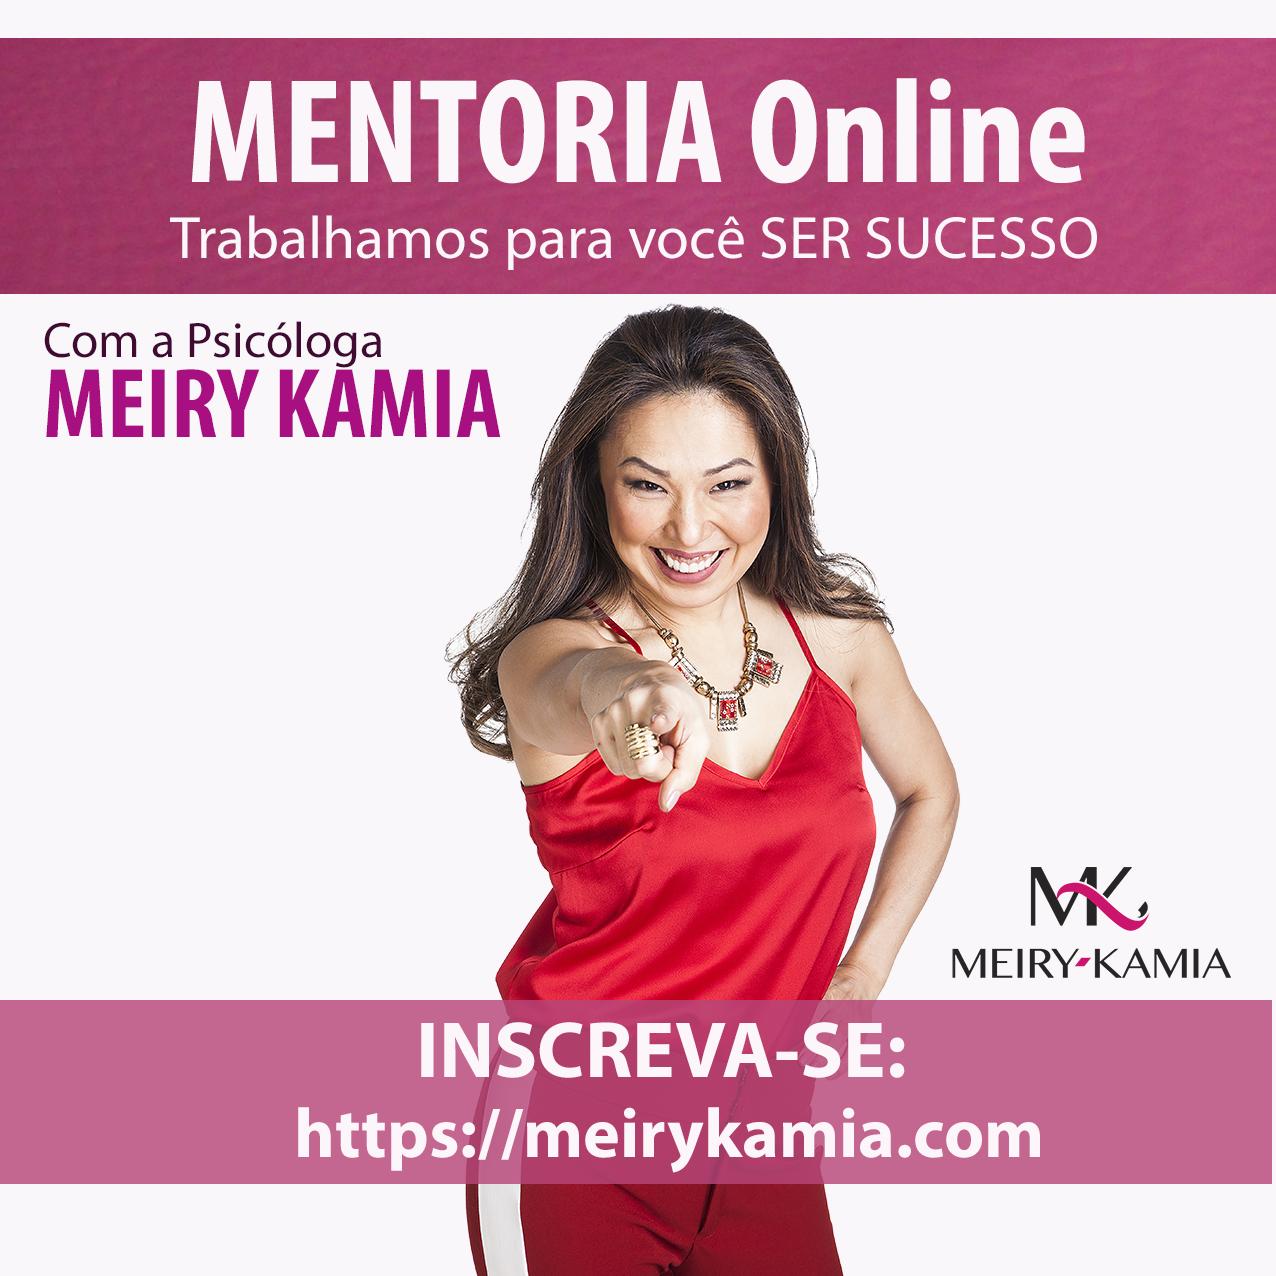 Mentoria_Online